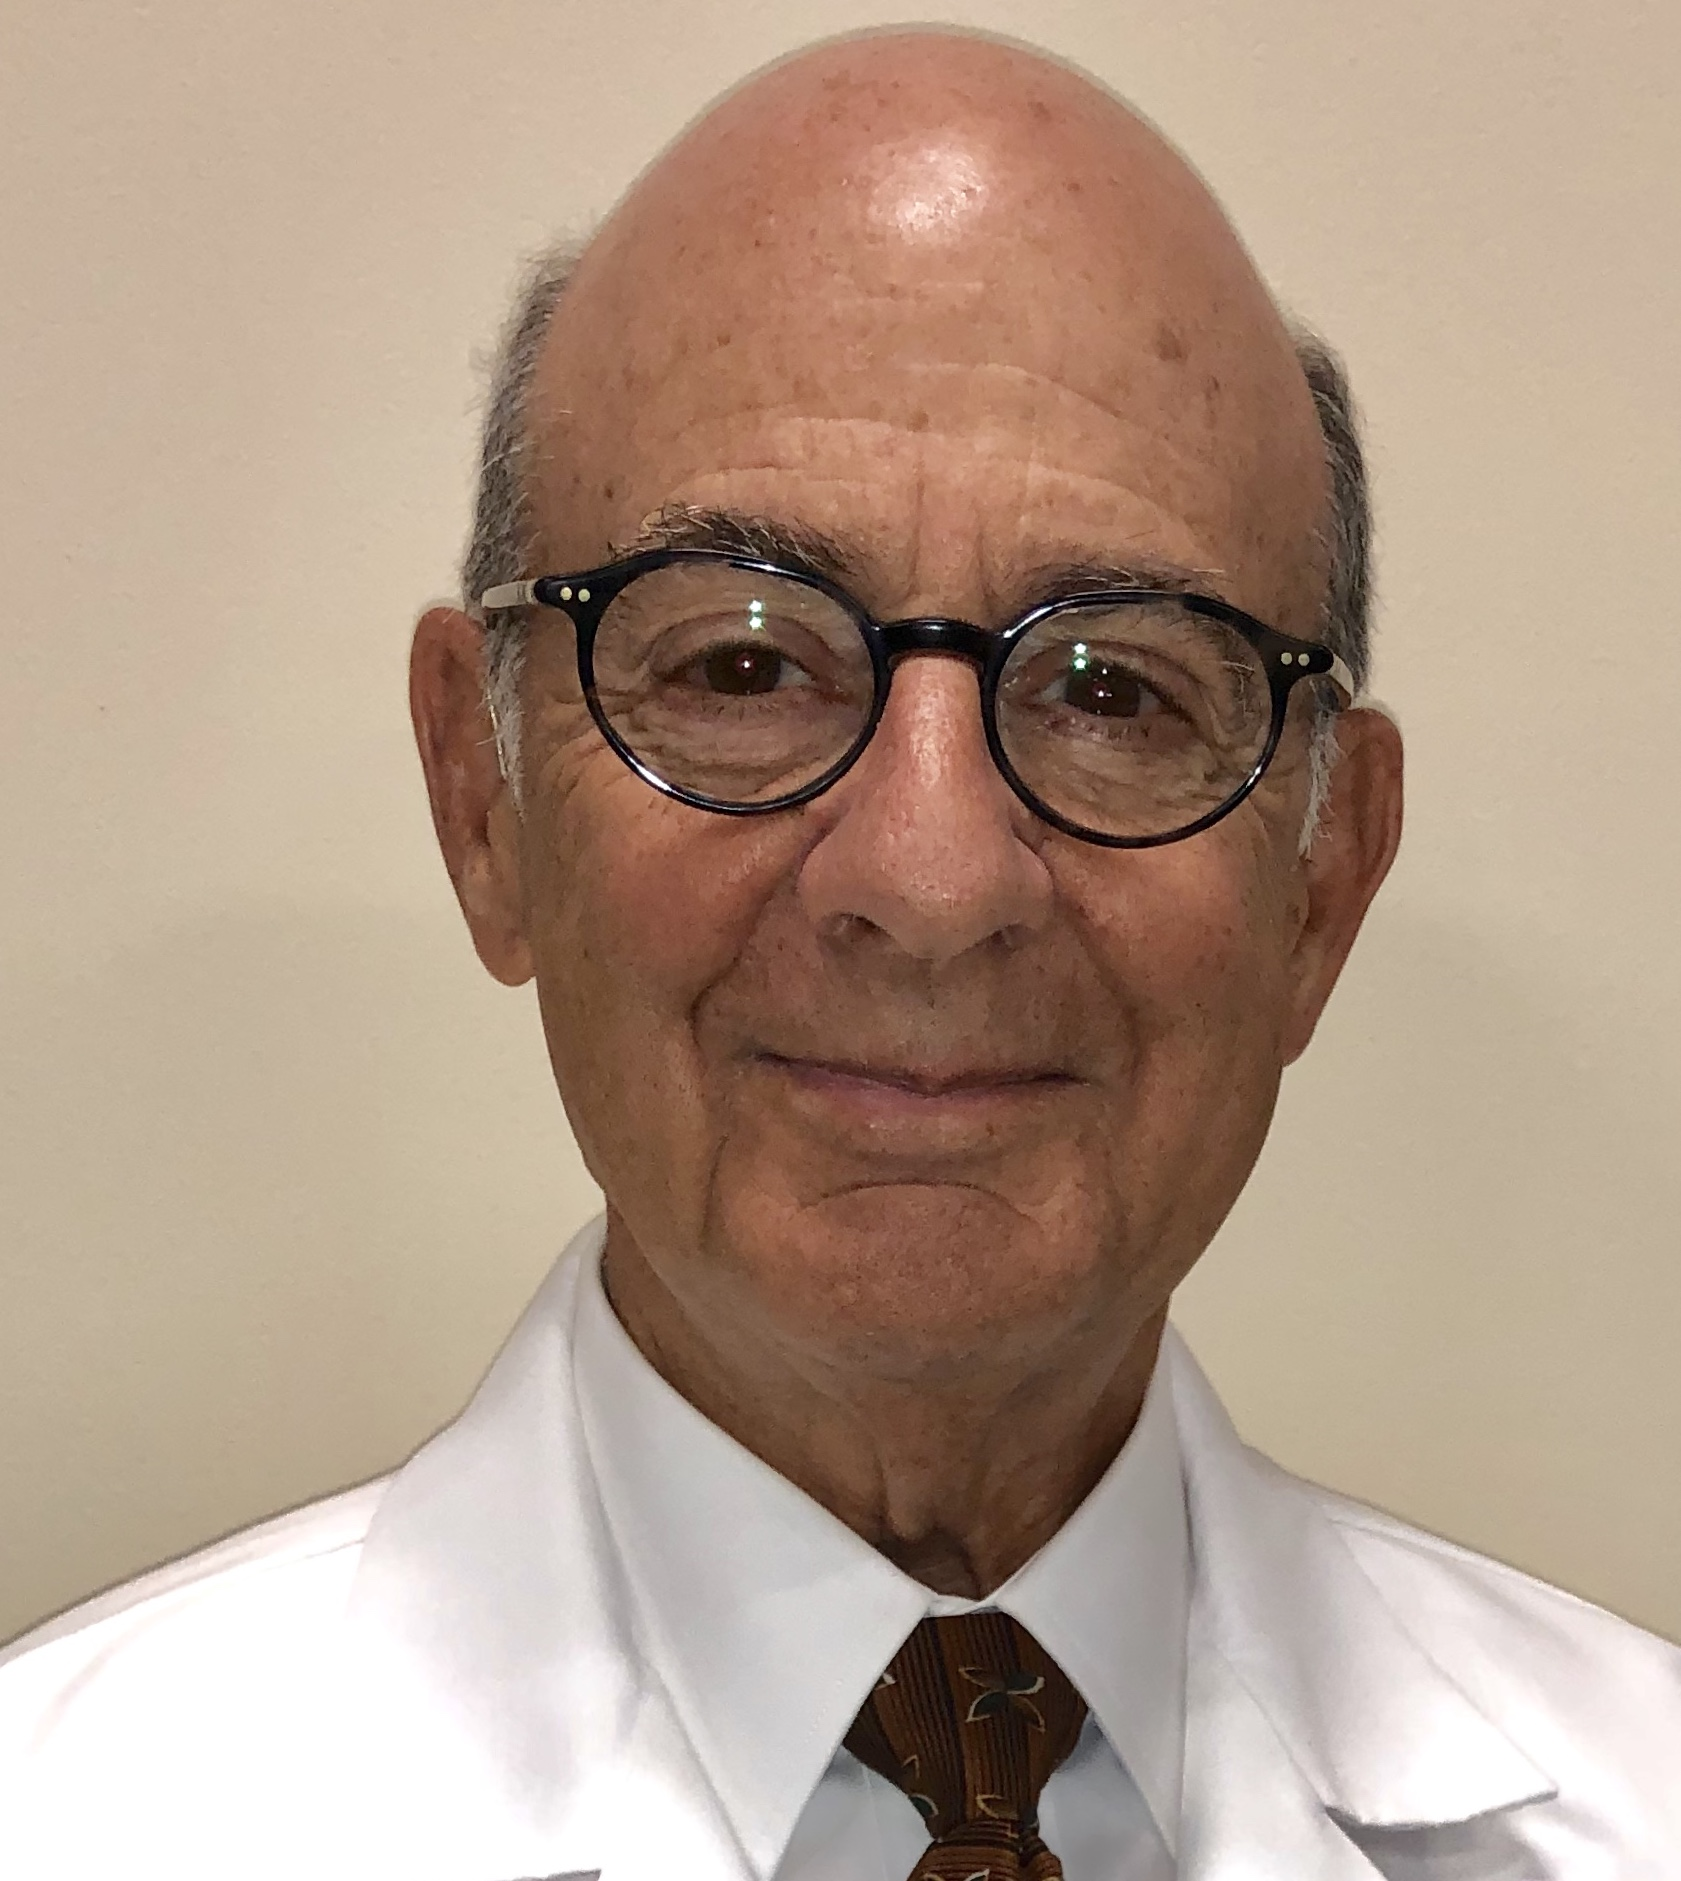 Arthur A. Topilow, MD